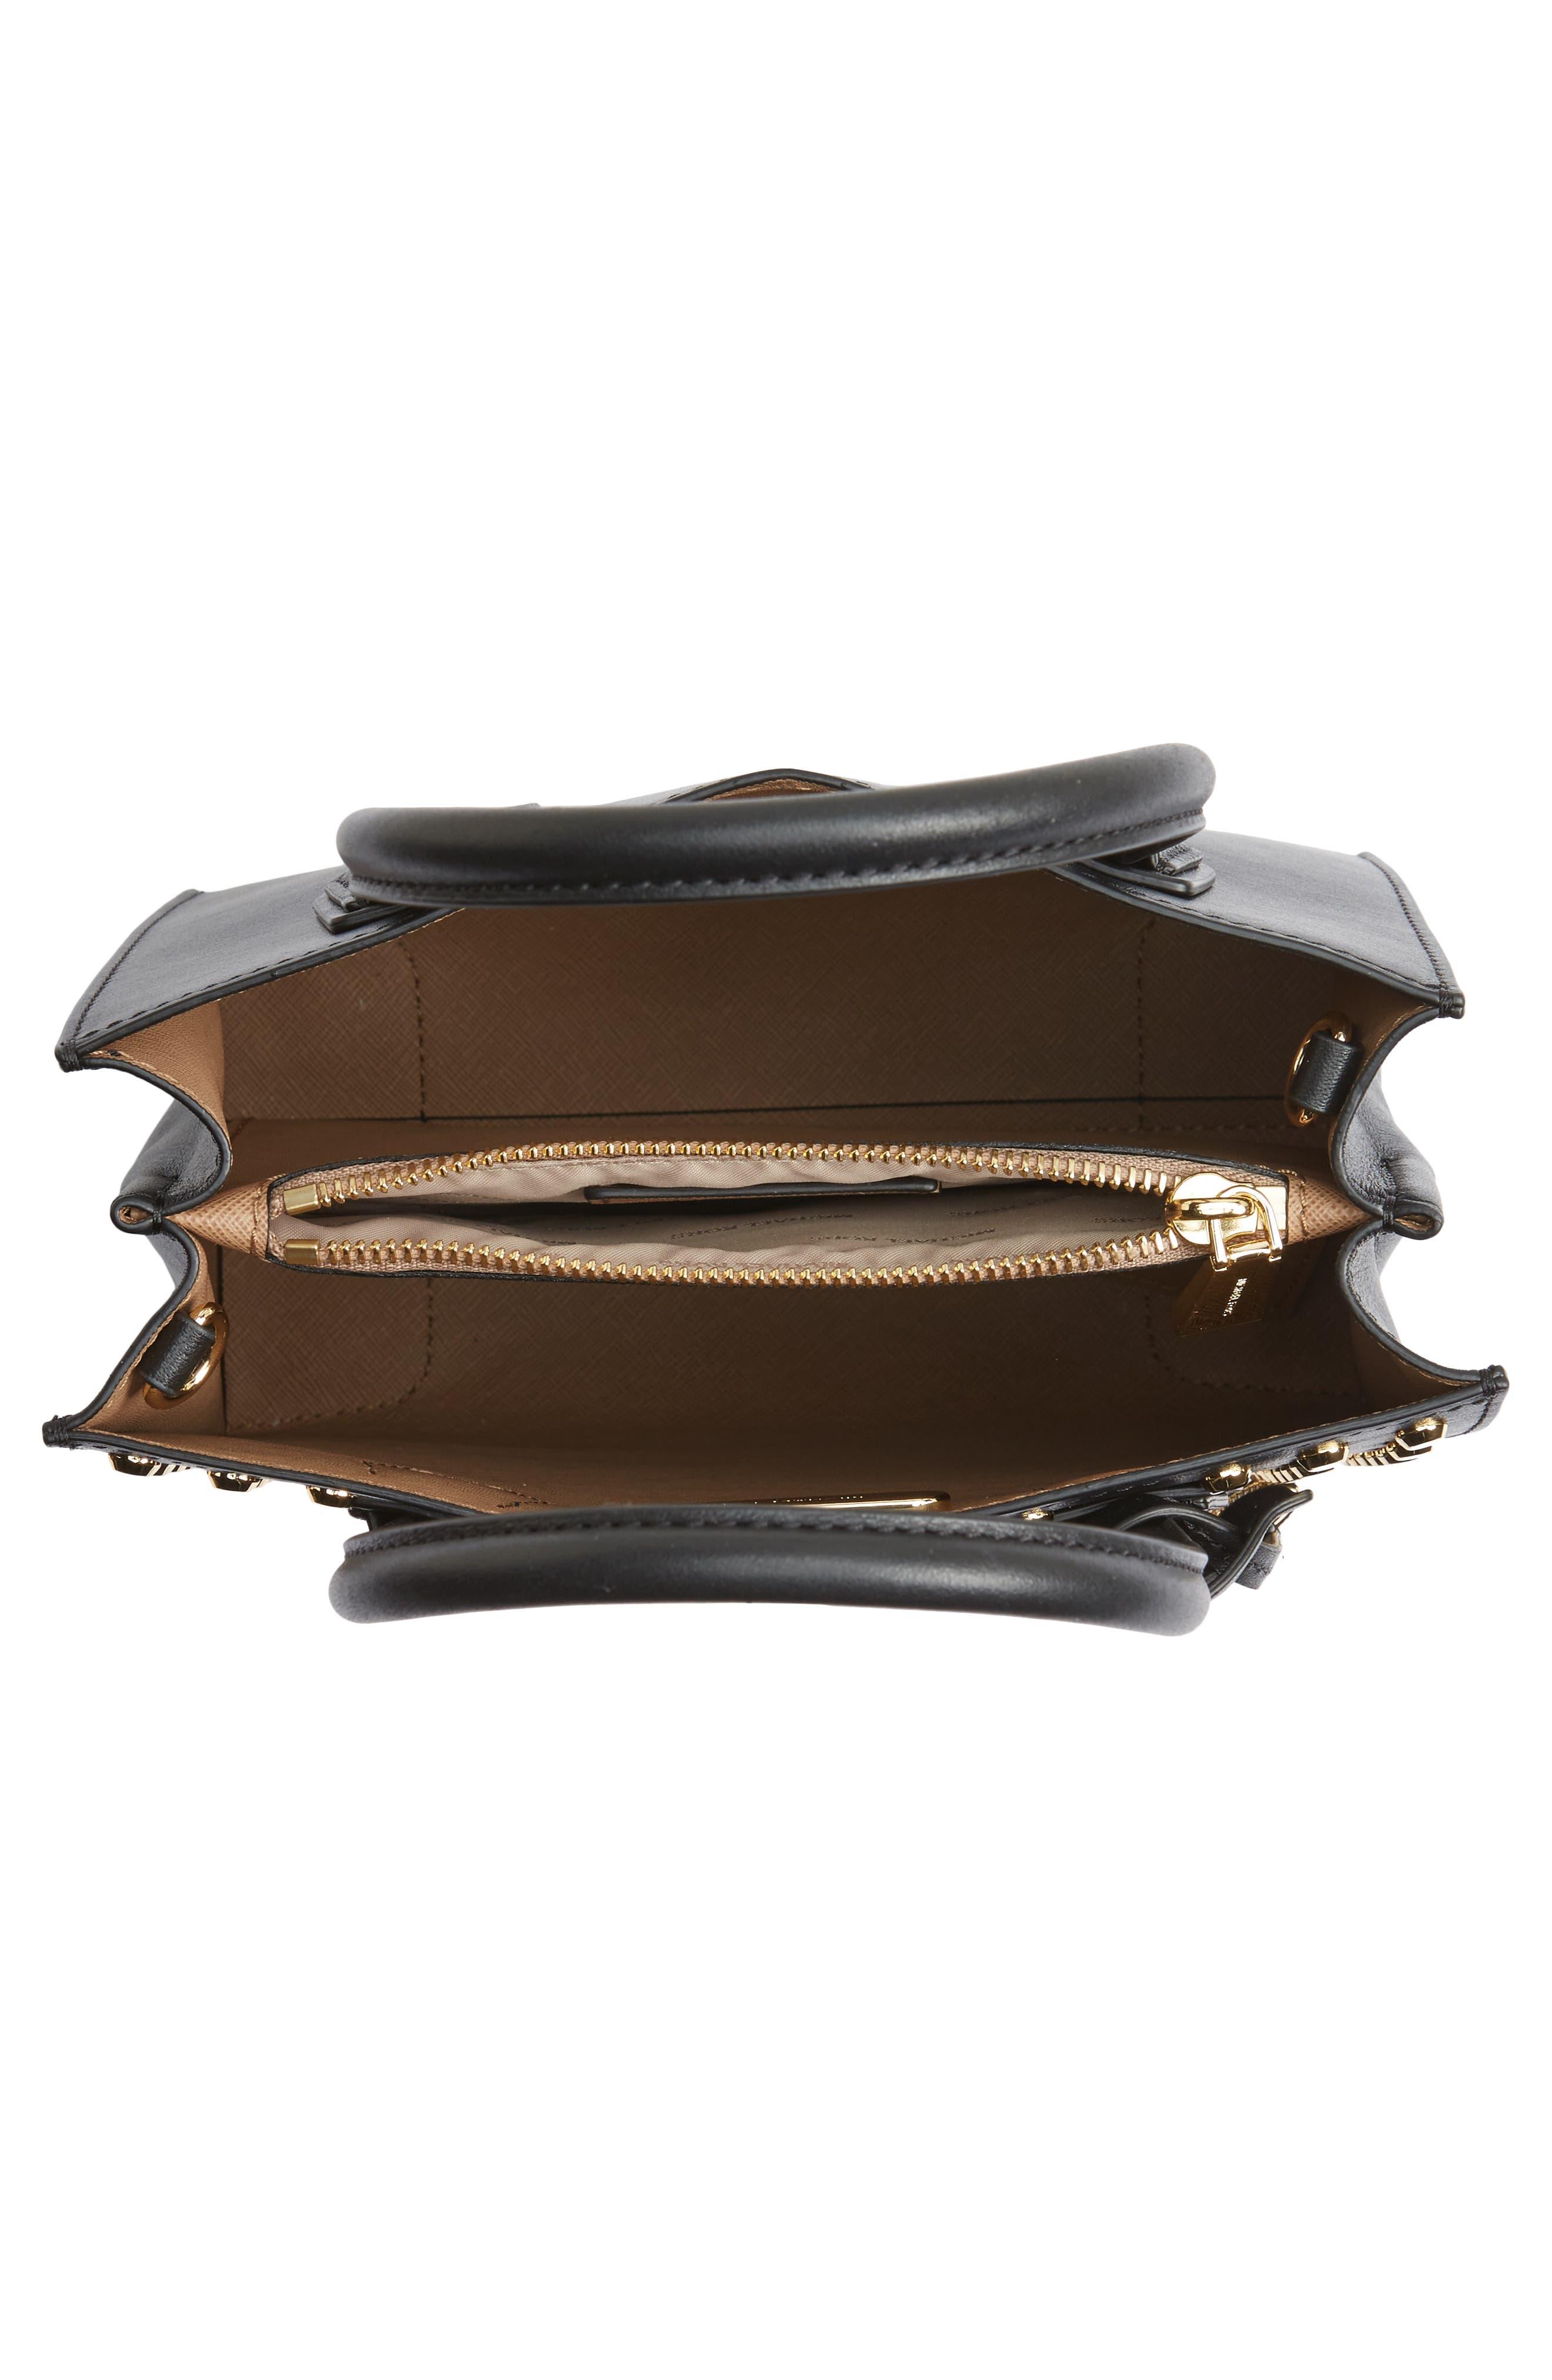 Medium Mercer Studded Leather Tote,                             Alternate thumbnail 4, color,                             001